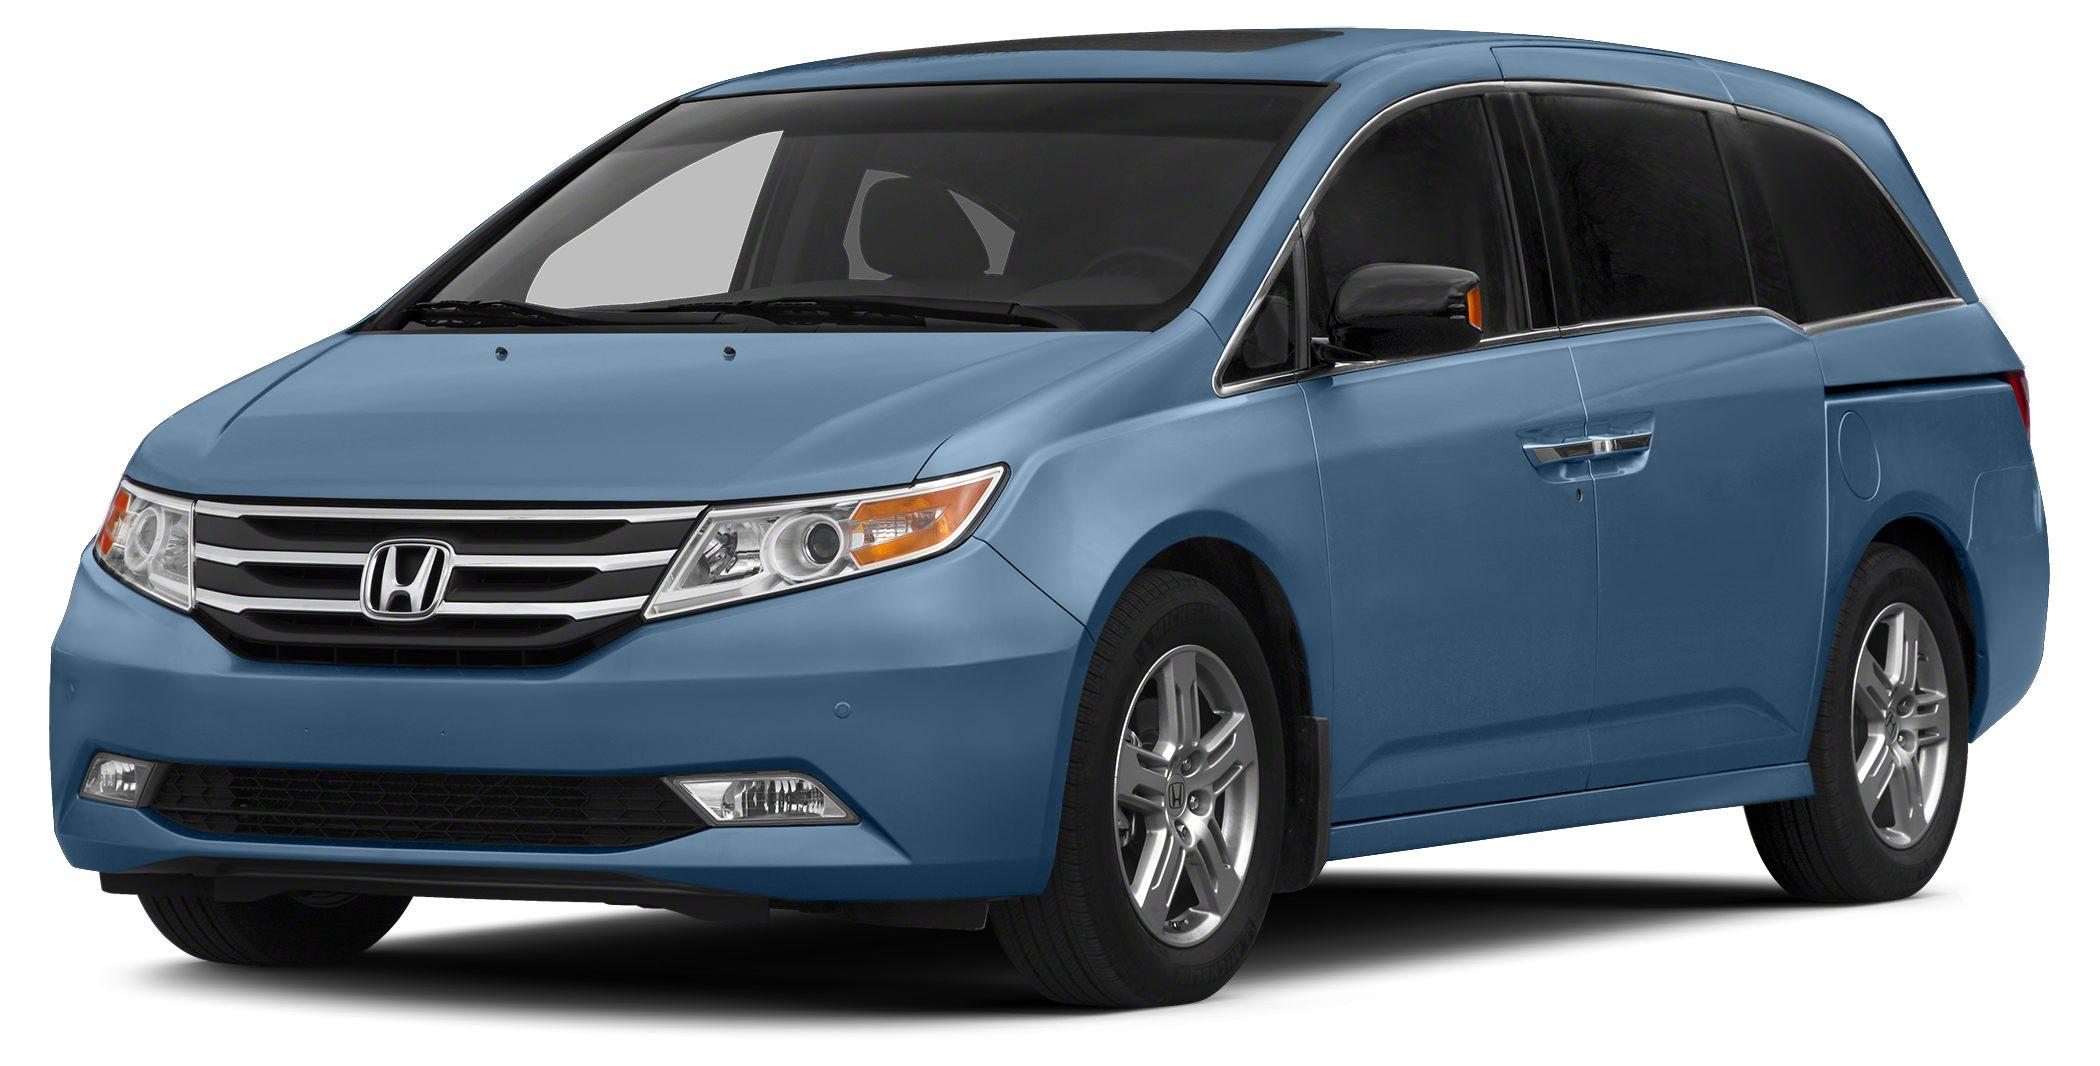 2013 Honda Odyssey EX-L w Navigation This 2013 Honda Odyssey 4dr EX-L features a 35L V6 CYLINDER